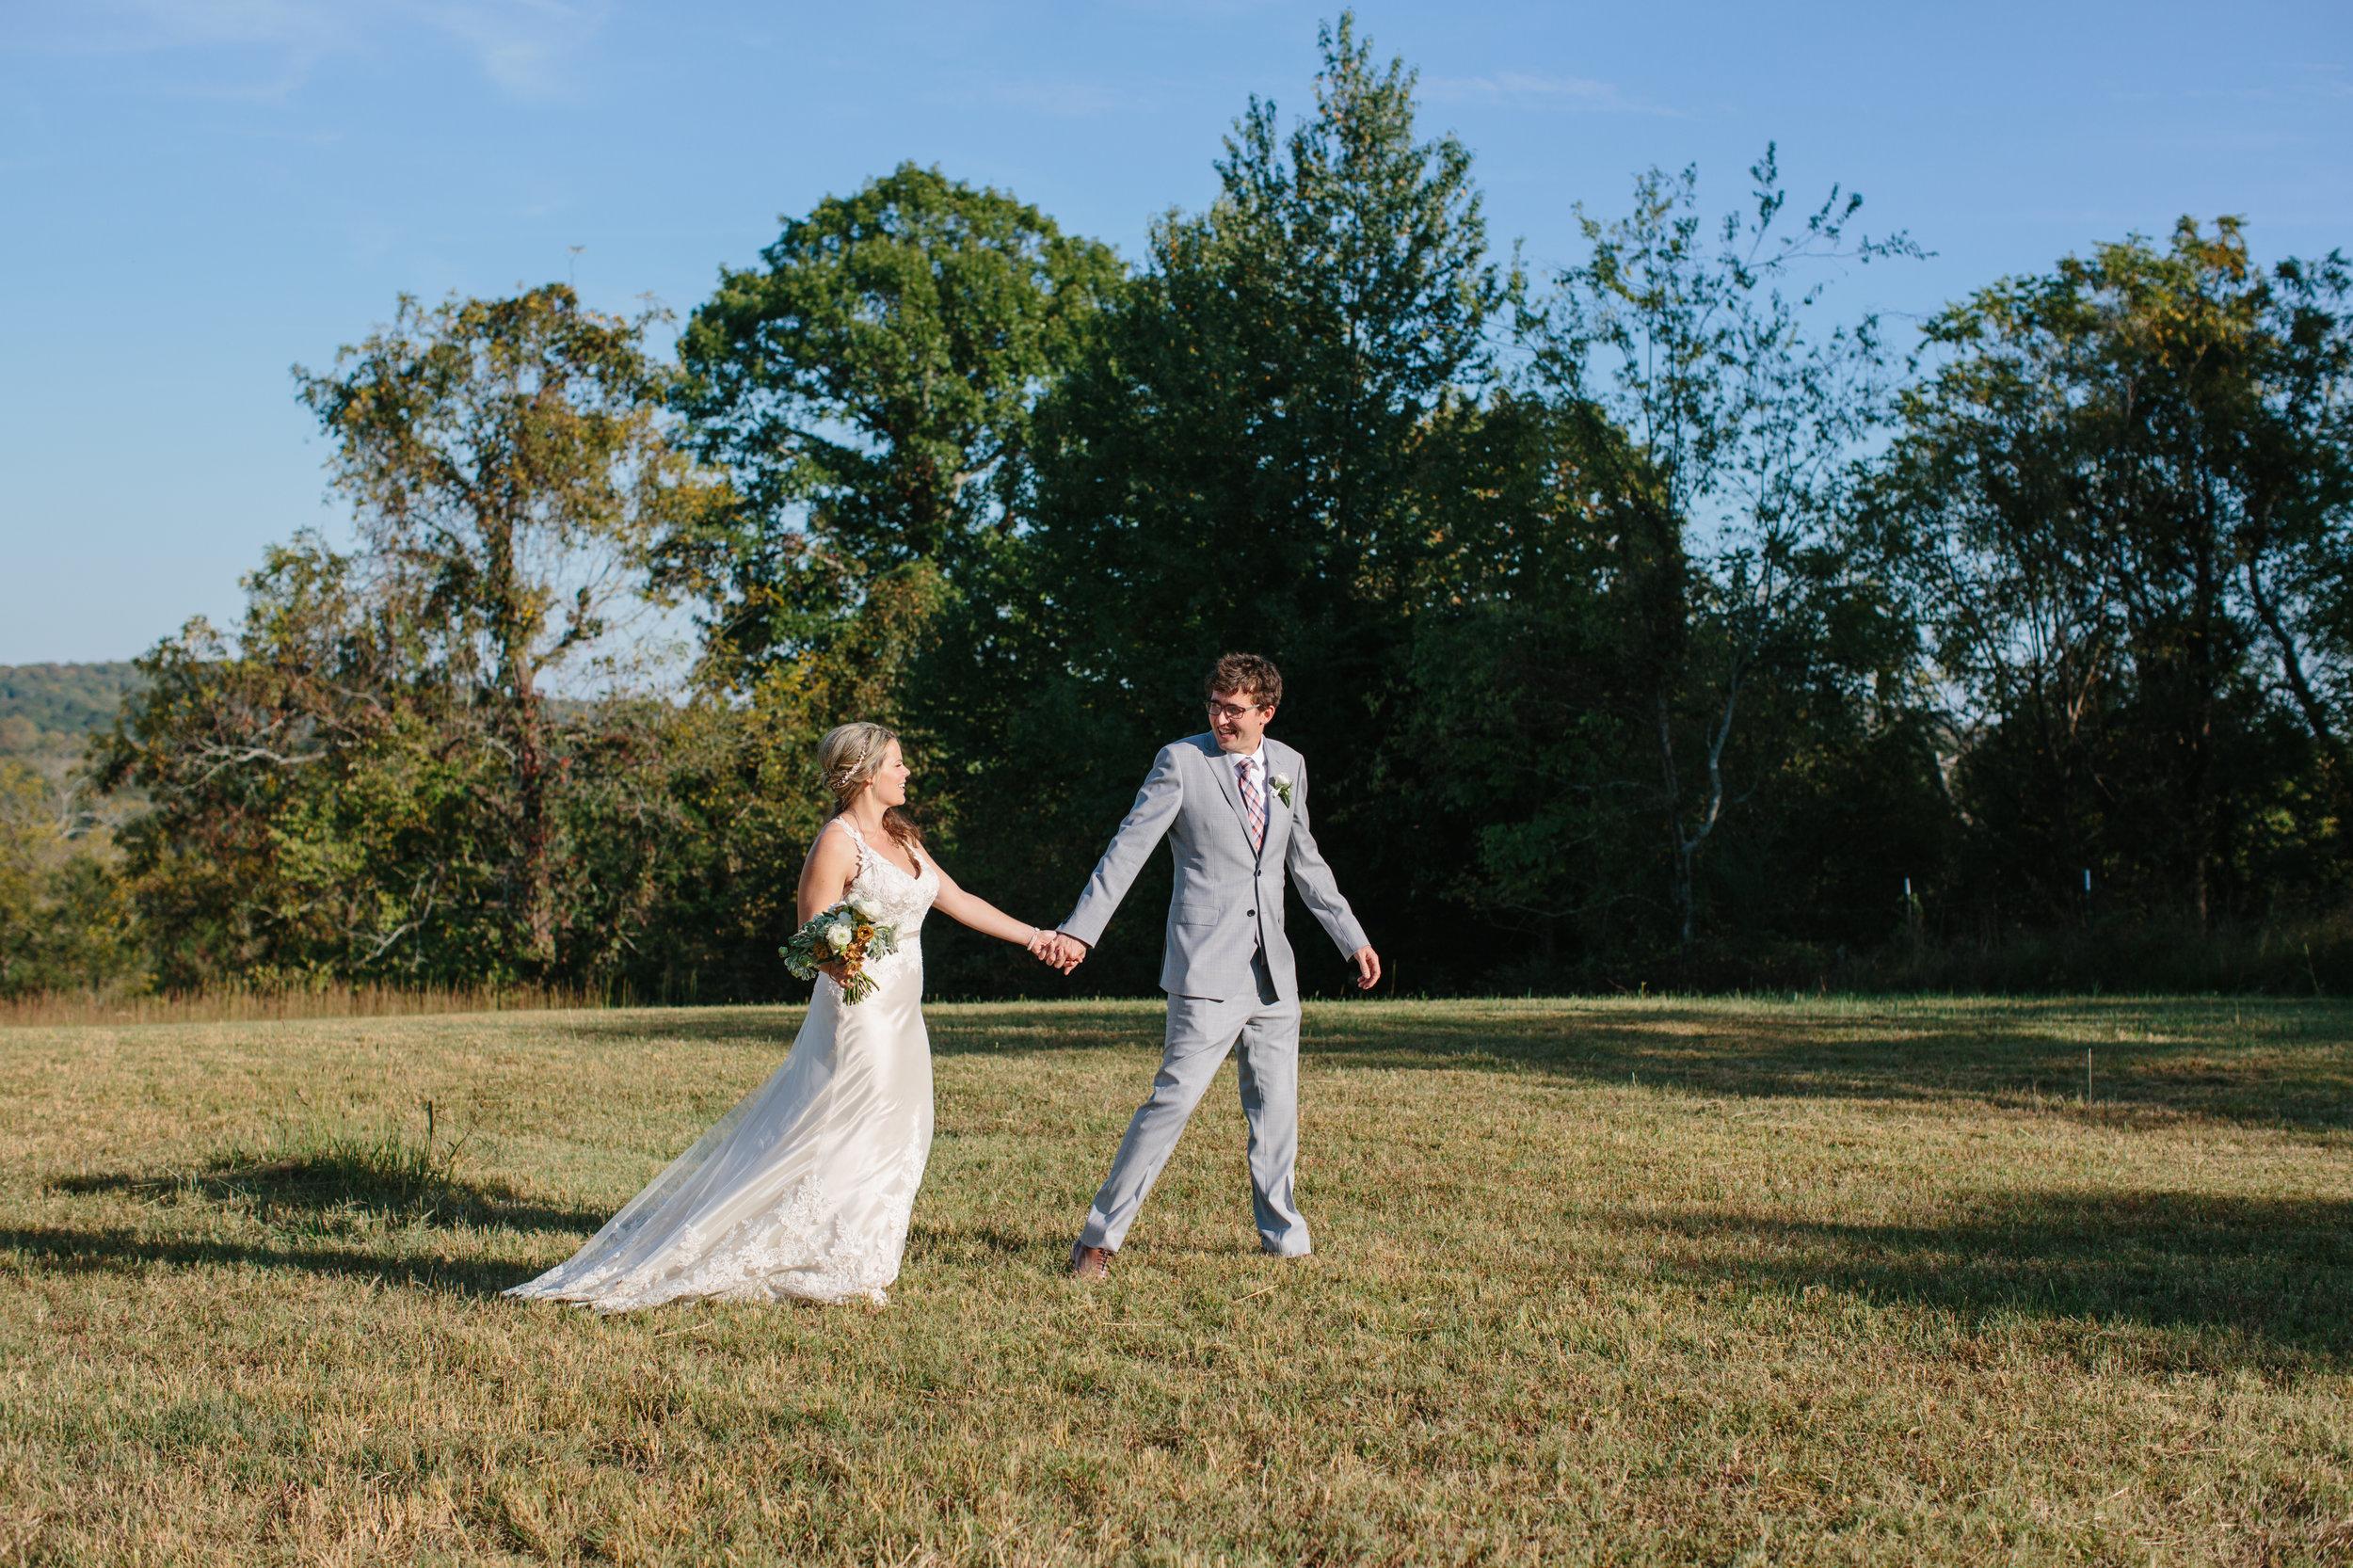 Abby_Simon_Wedding_Abigail_Malone_Photography_nashville_Bloomsbury_Farm-381.jpg